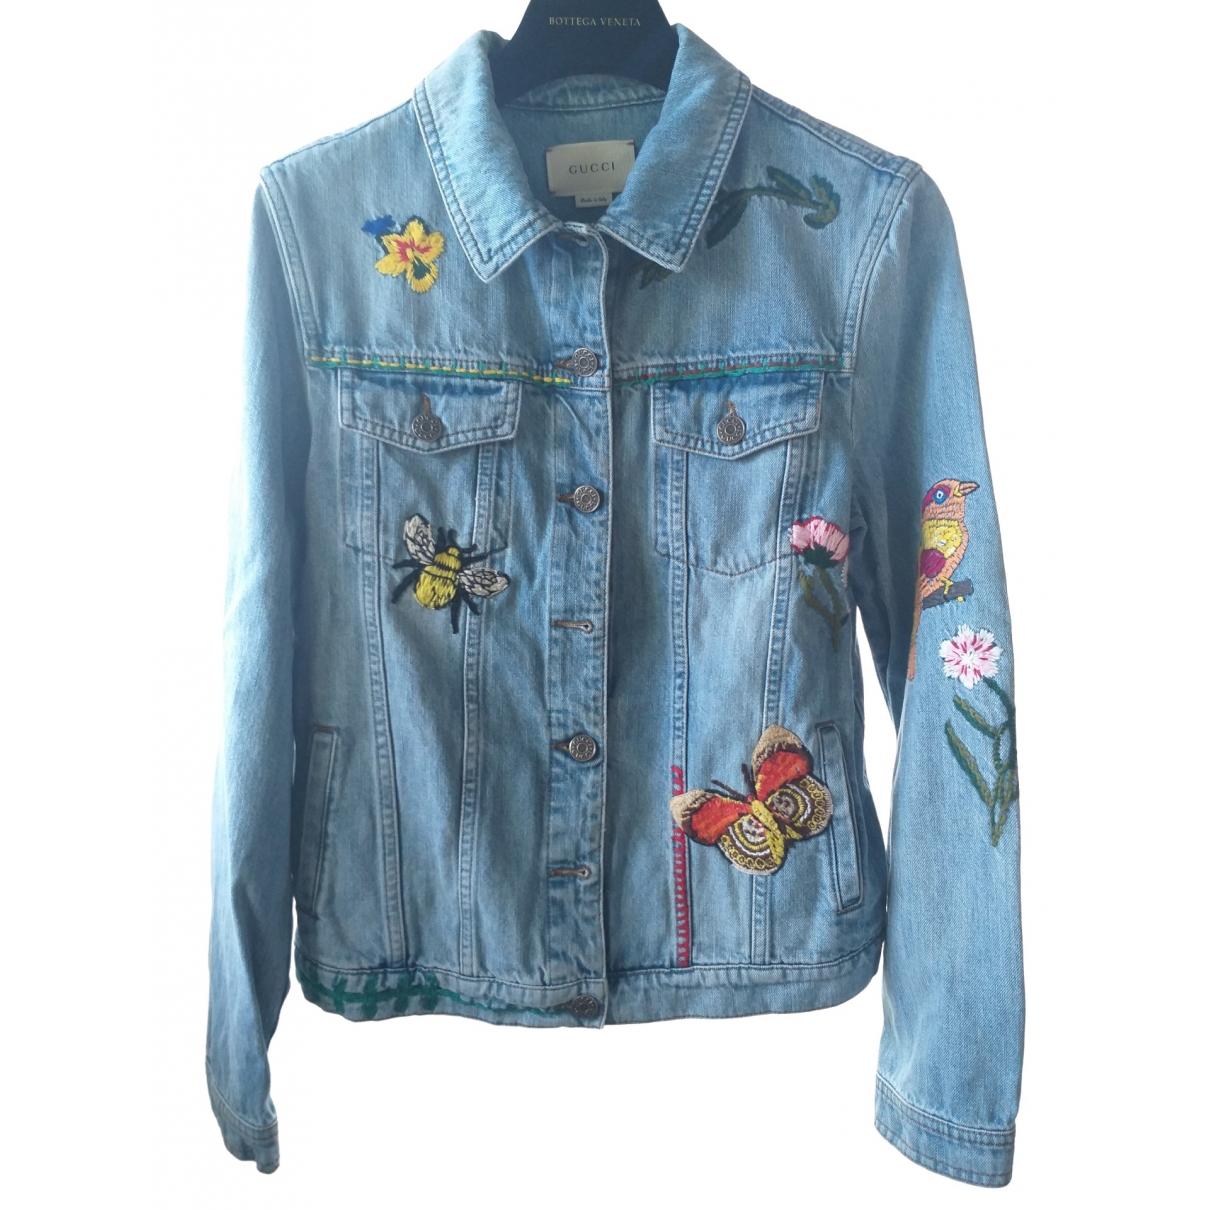 Gucci \N Jacke, Maentel in  Blau Denim - Jeans